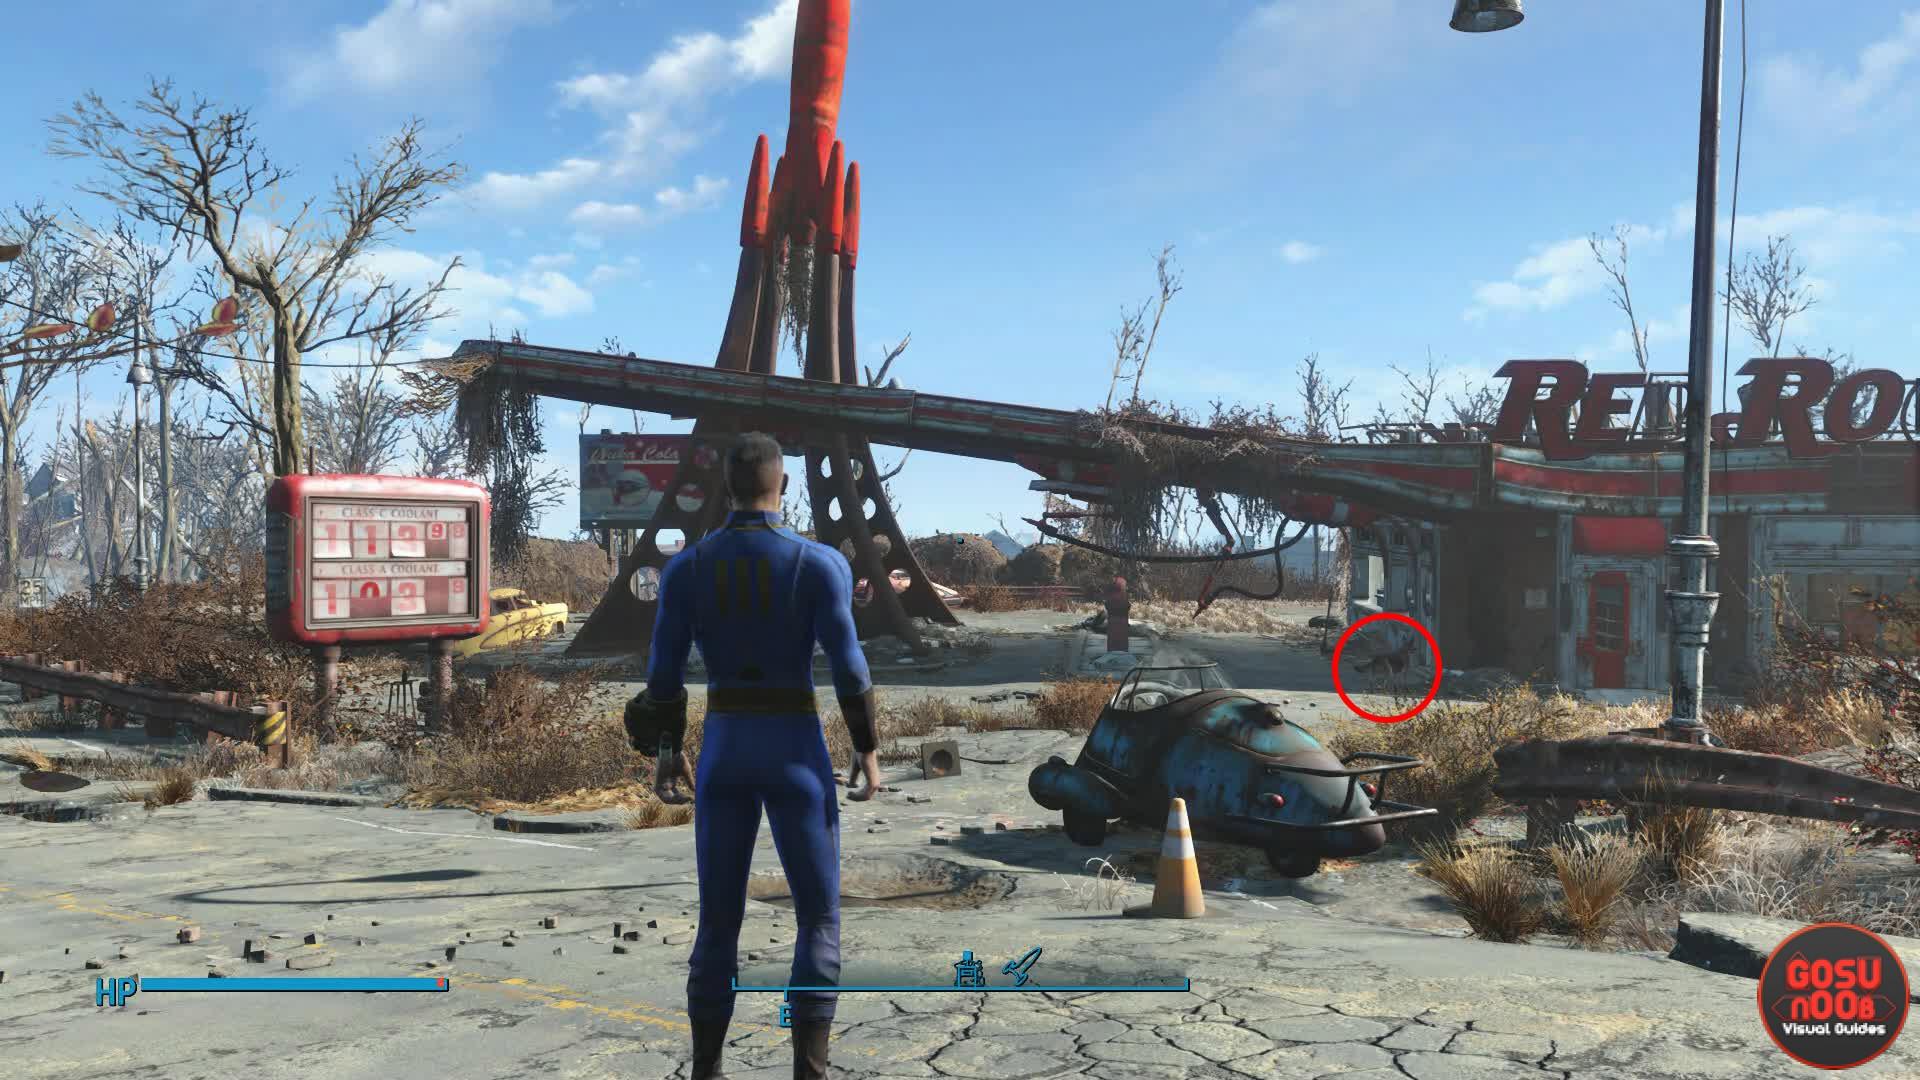 Dogmeat | Fallout 4 Companion on